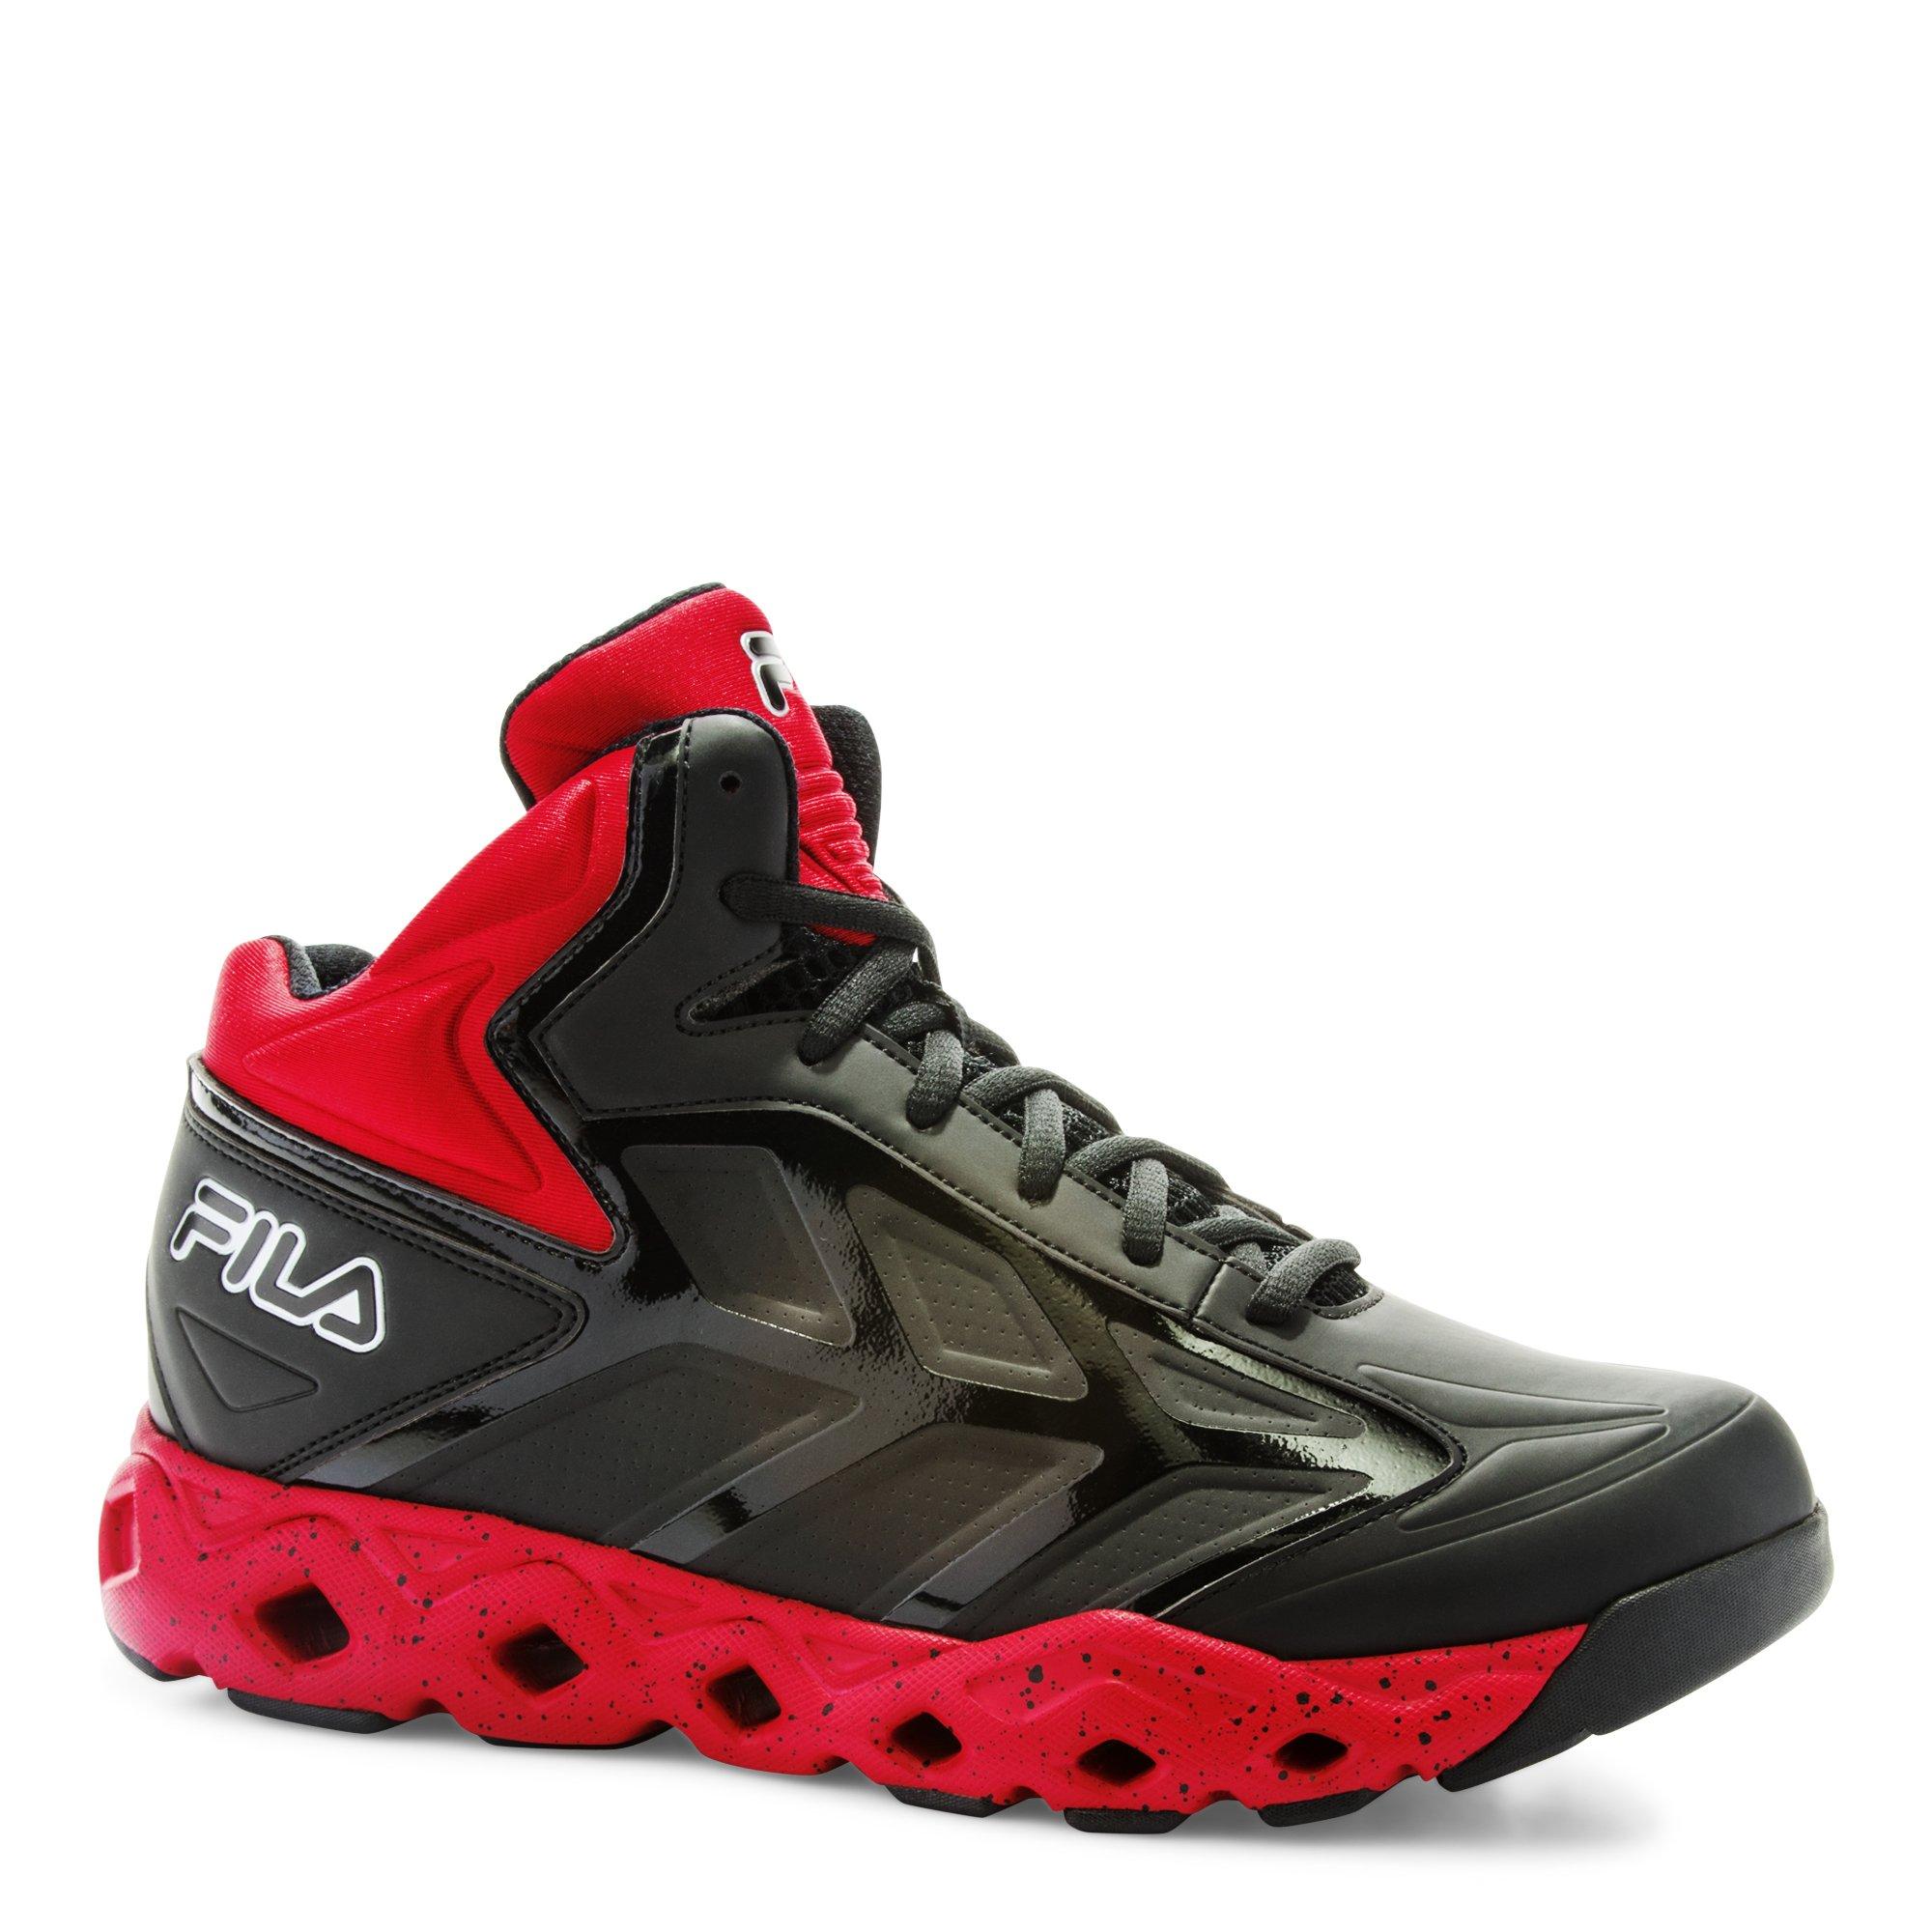 e5d4de30e55a Galleon - Fila Men s Torranado Basketball Shoe